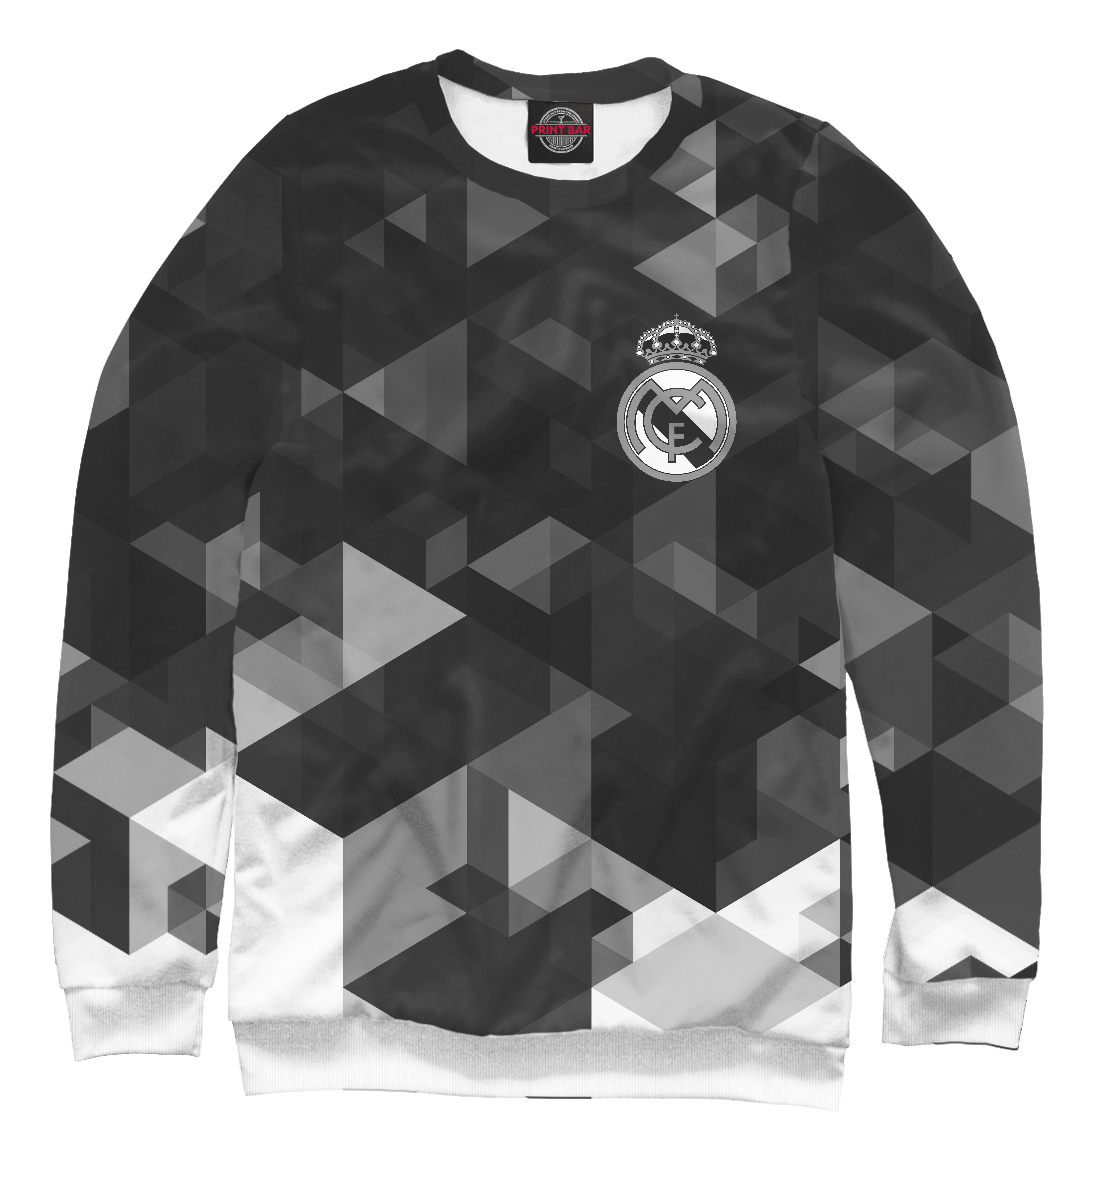 Купить Real Madrid Abstract Collection, Printbar, Свитшоты, REA-765276-swi-1